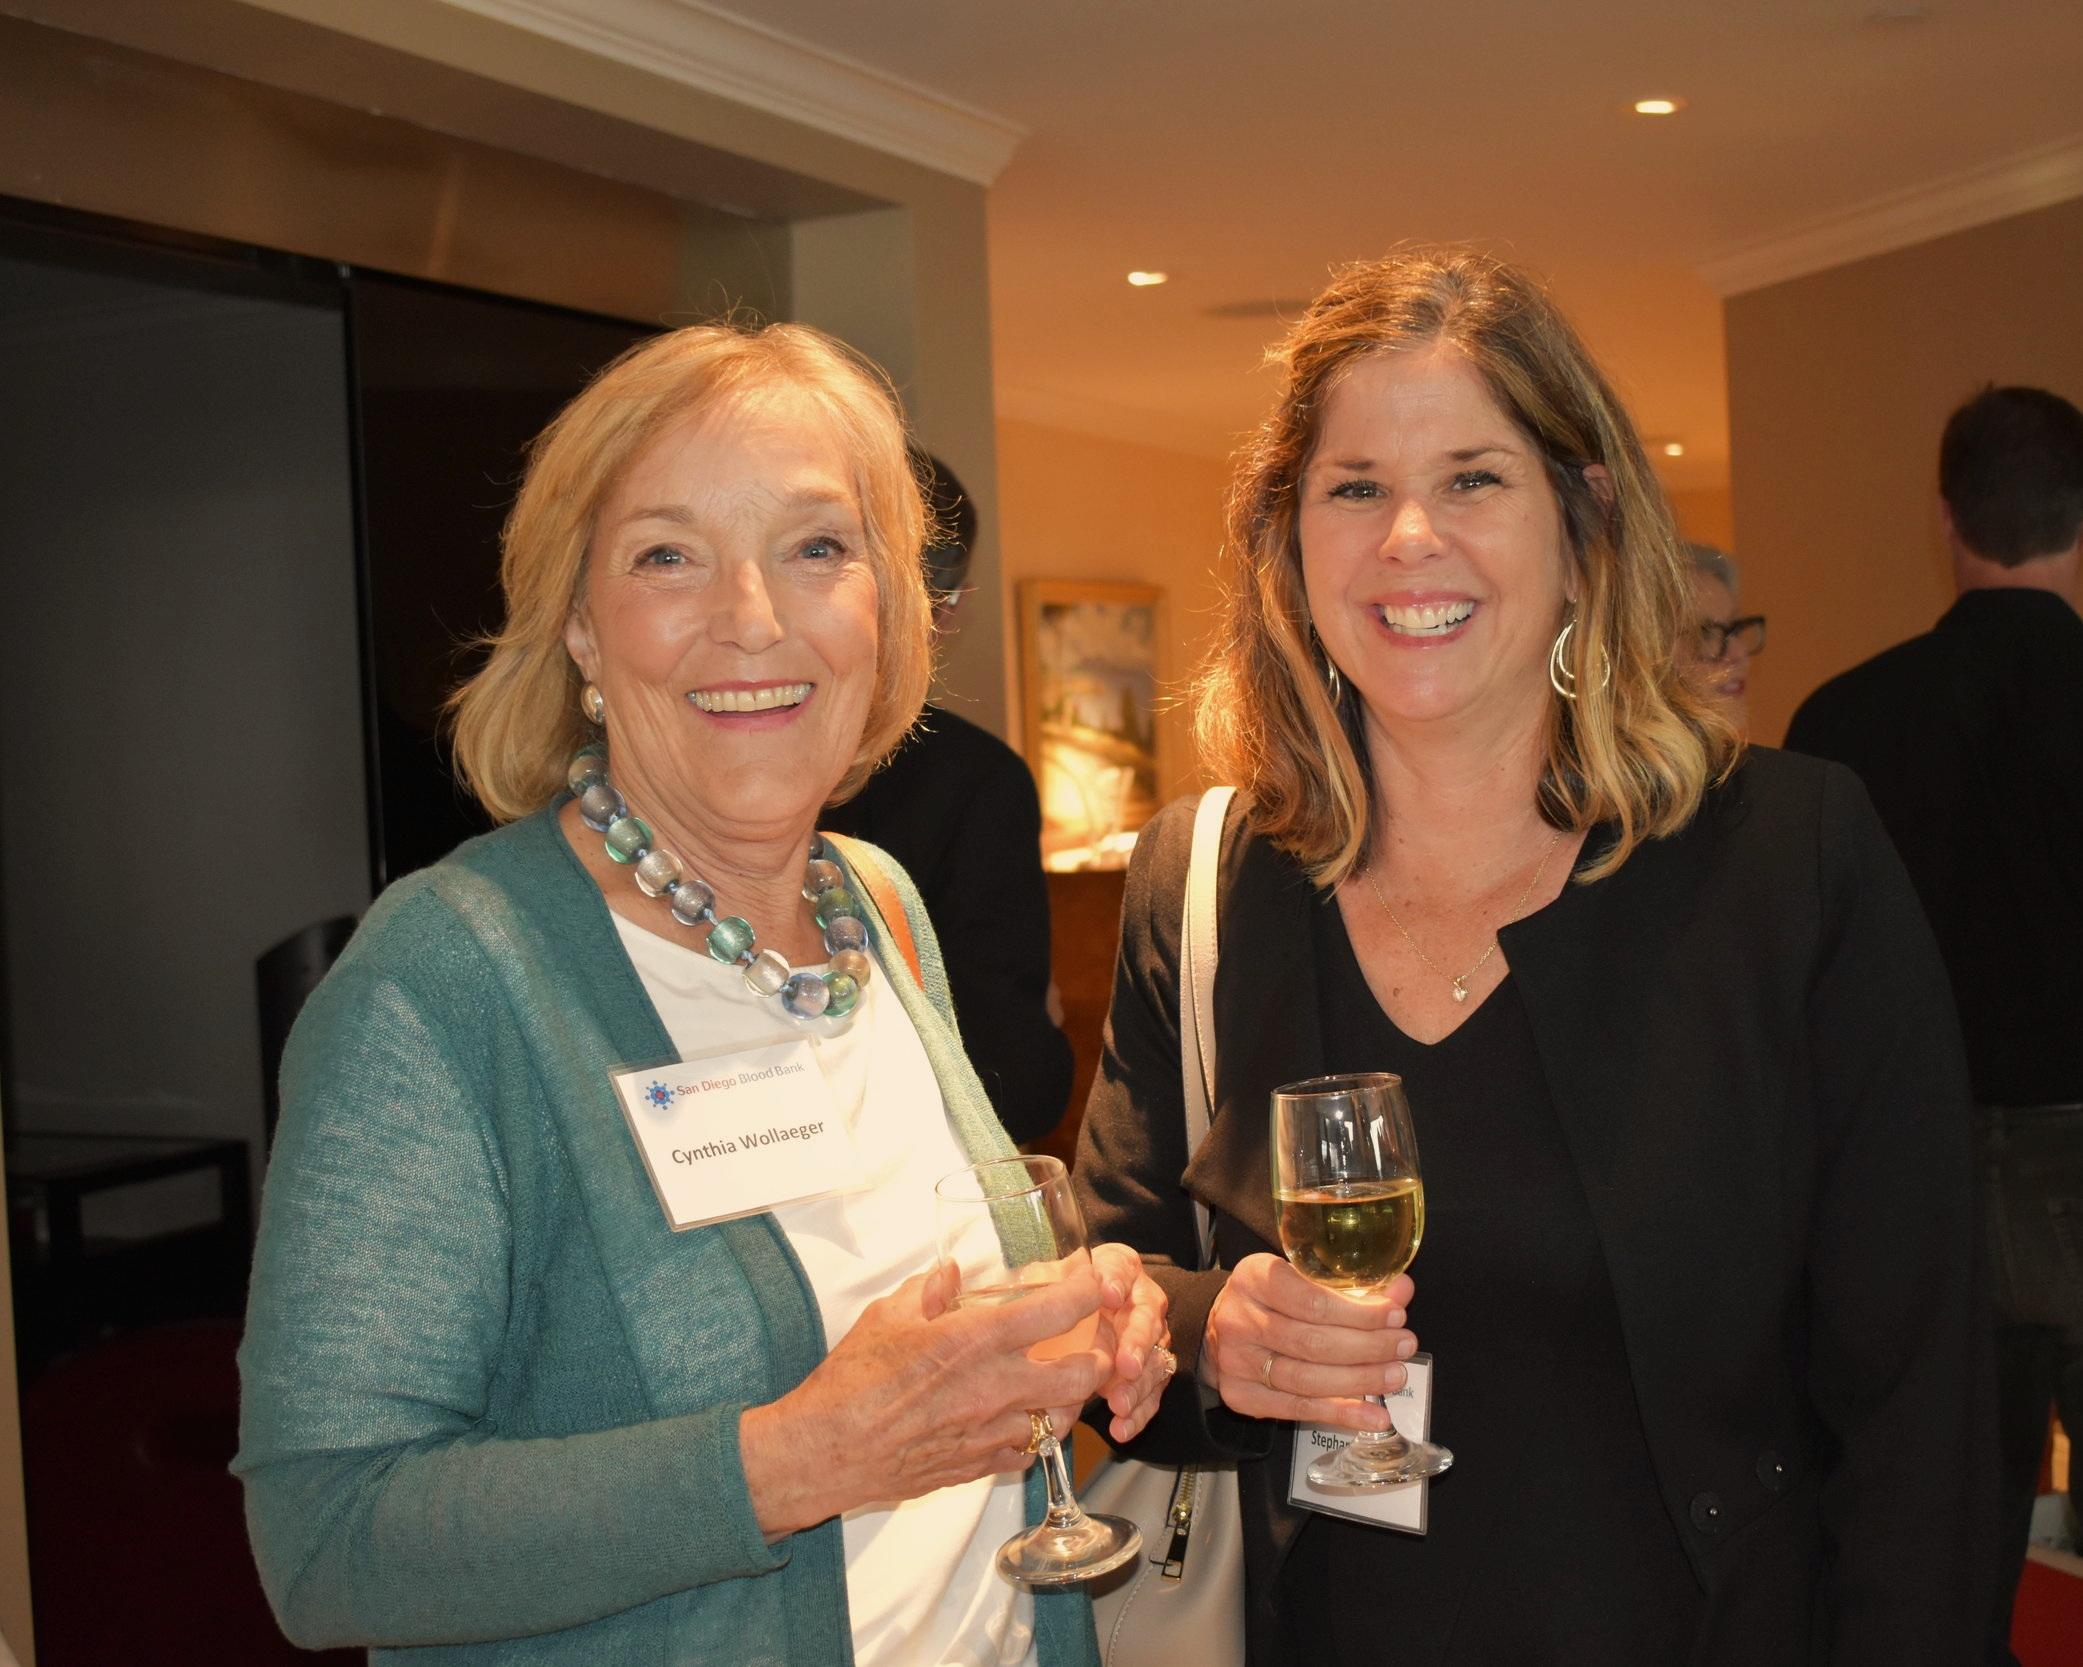 Cynthia Wollaeger and Stephanie Teeple